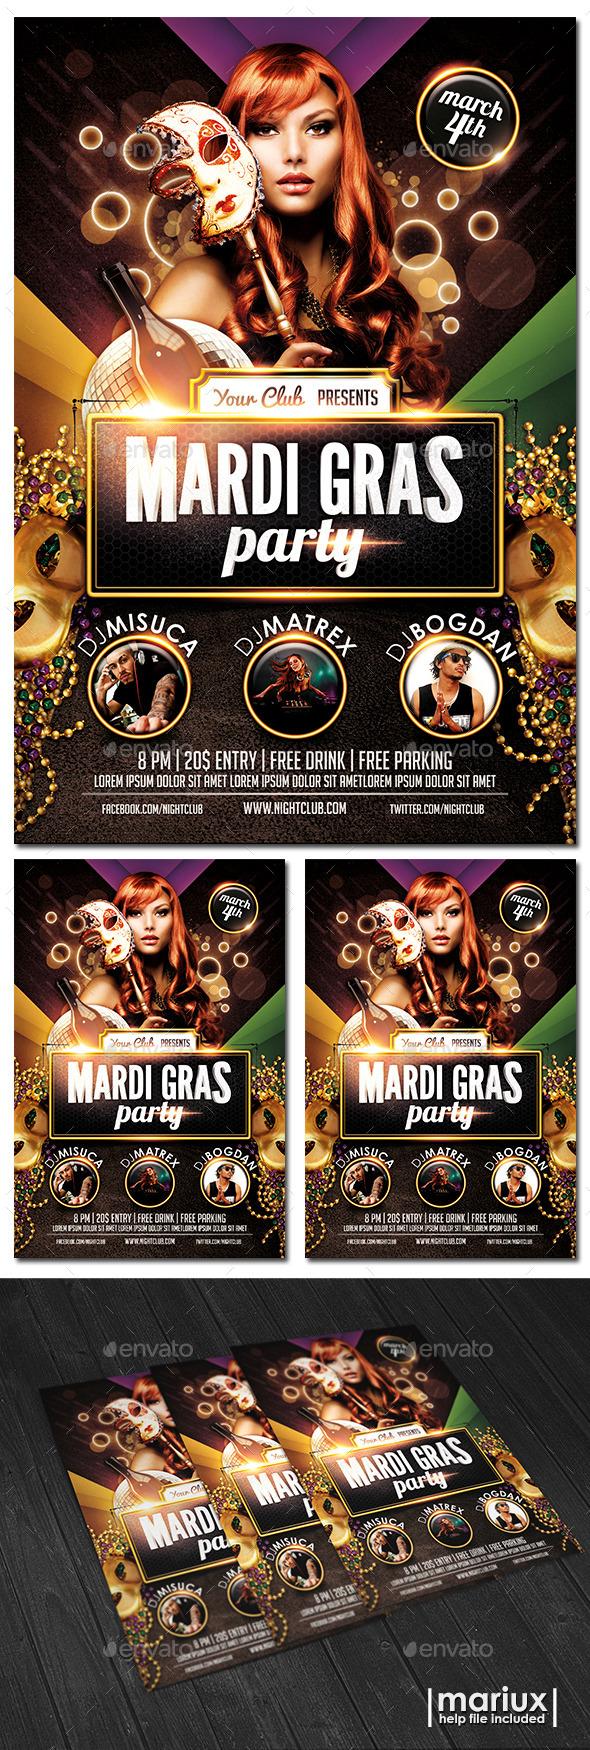 GraphicRiver Mardi Gras Party Flyer 9935776